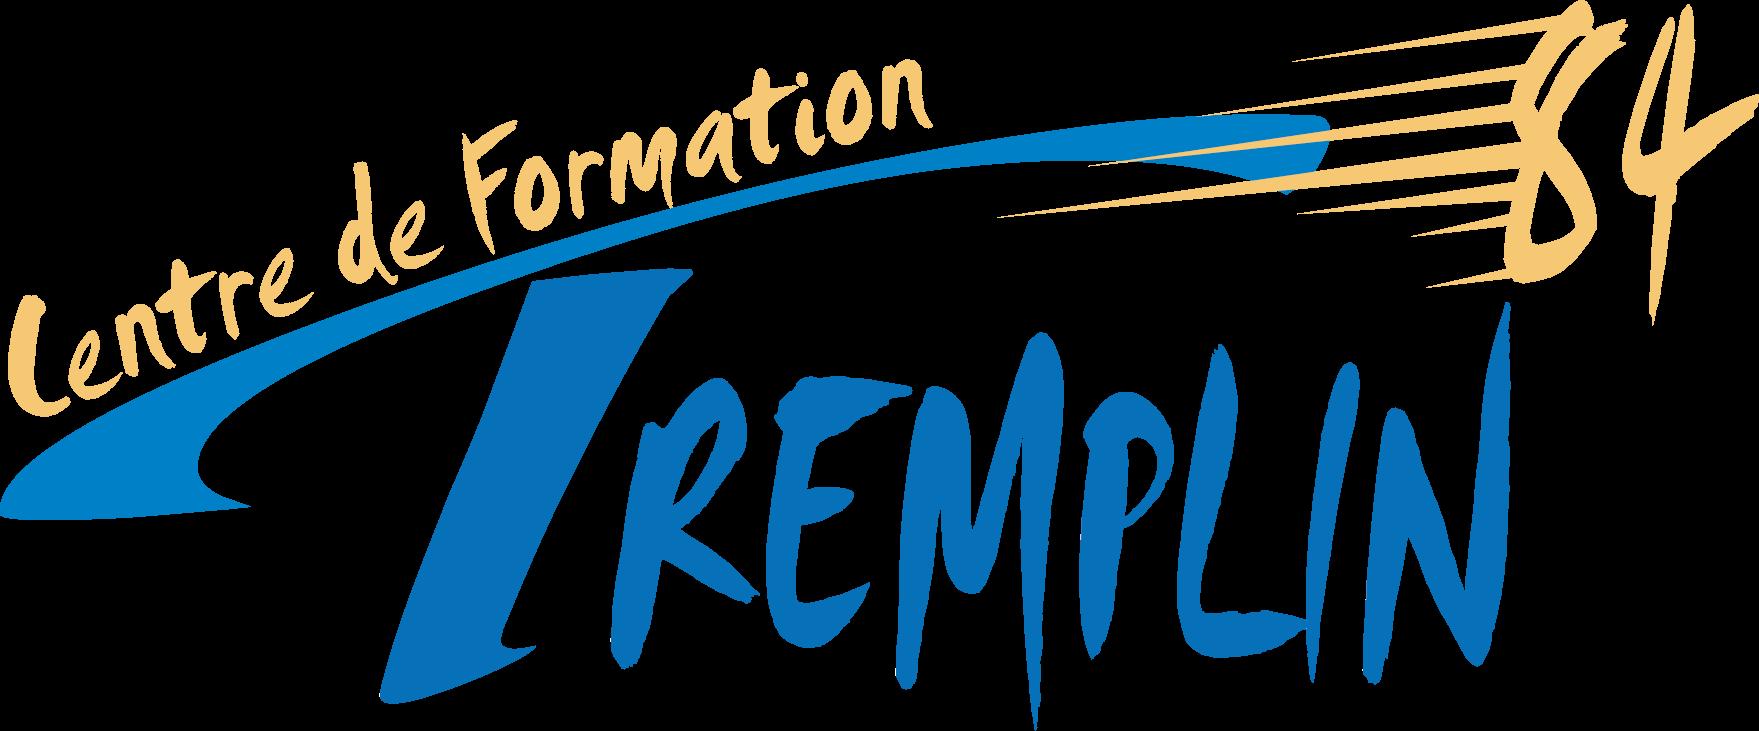 Centre de formation Tremplin 84